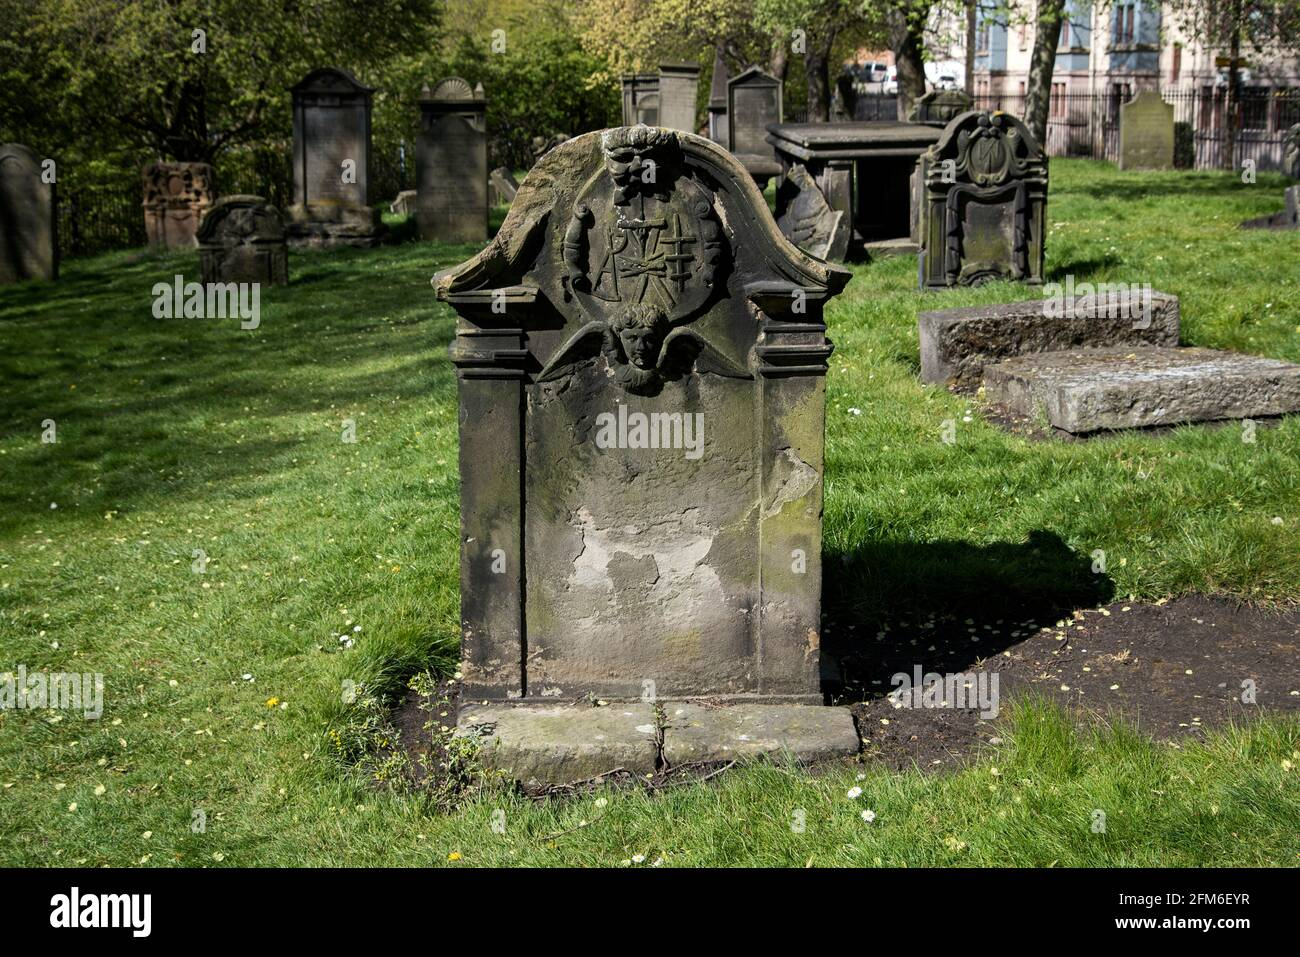 18th century headstone in North Leith Burial Ground, Edinburgh, Scotland, UK. Stock Photo